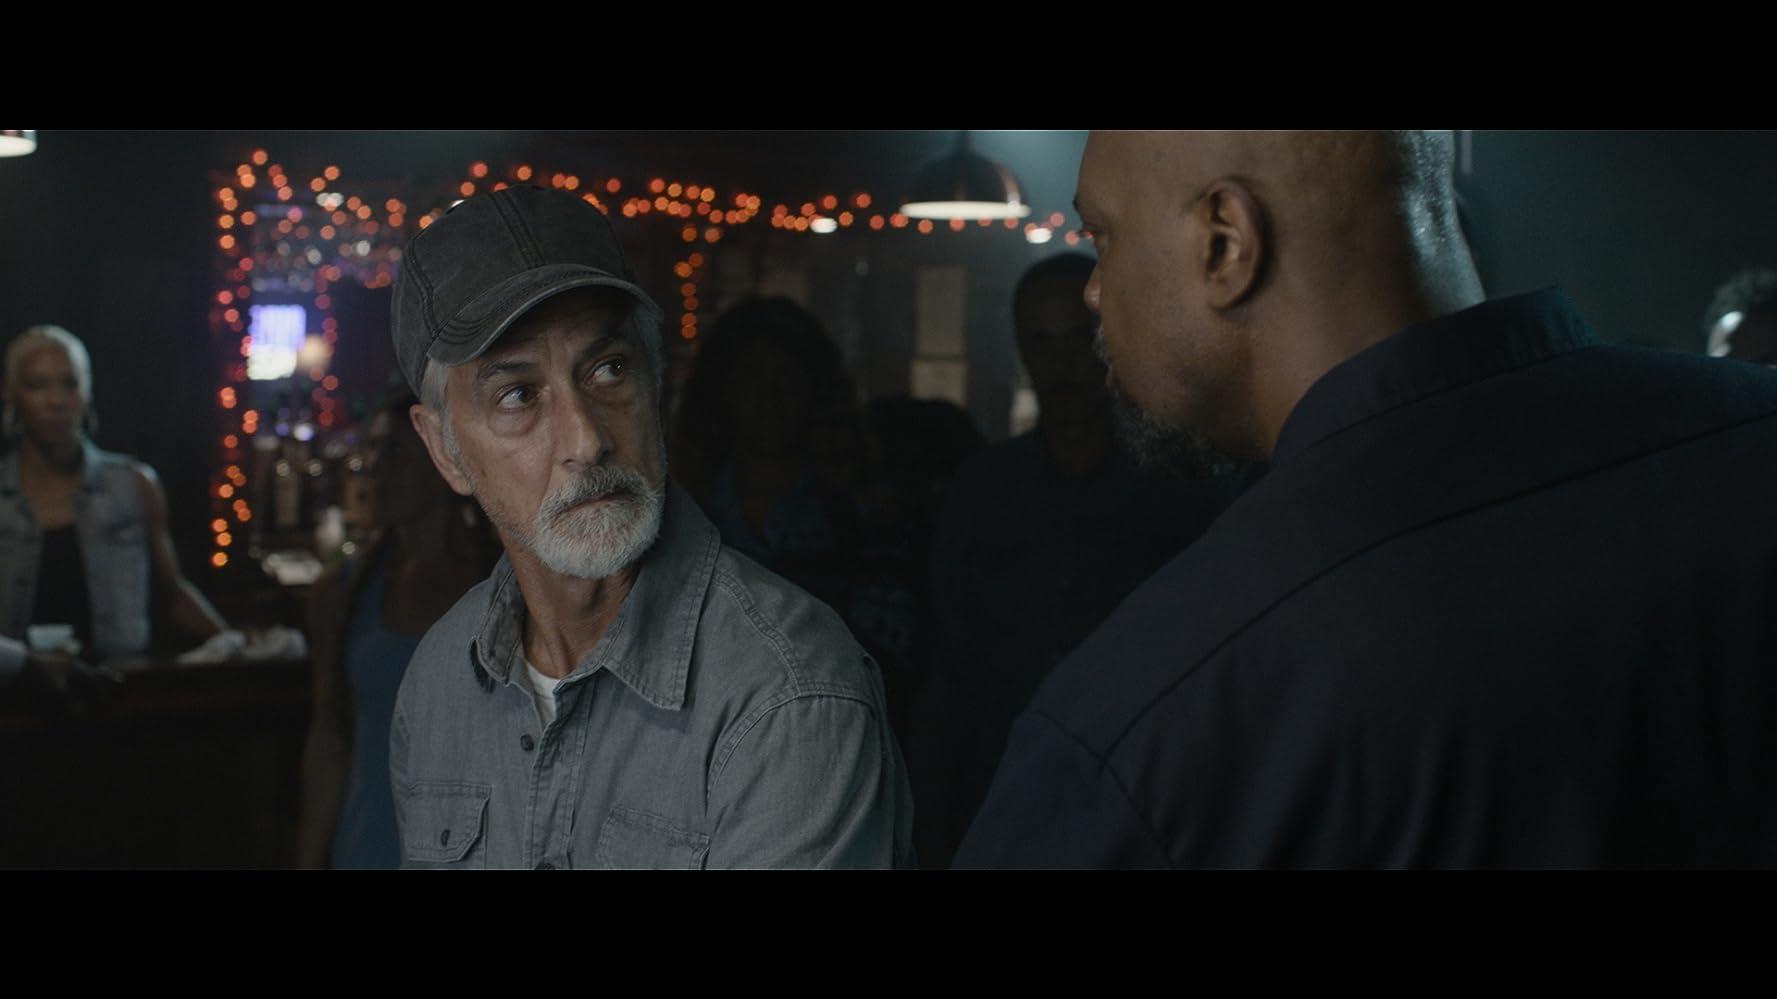 David Strathairn in Walkaway Joe (2020)